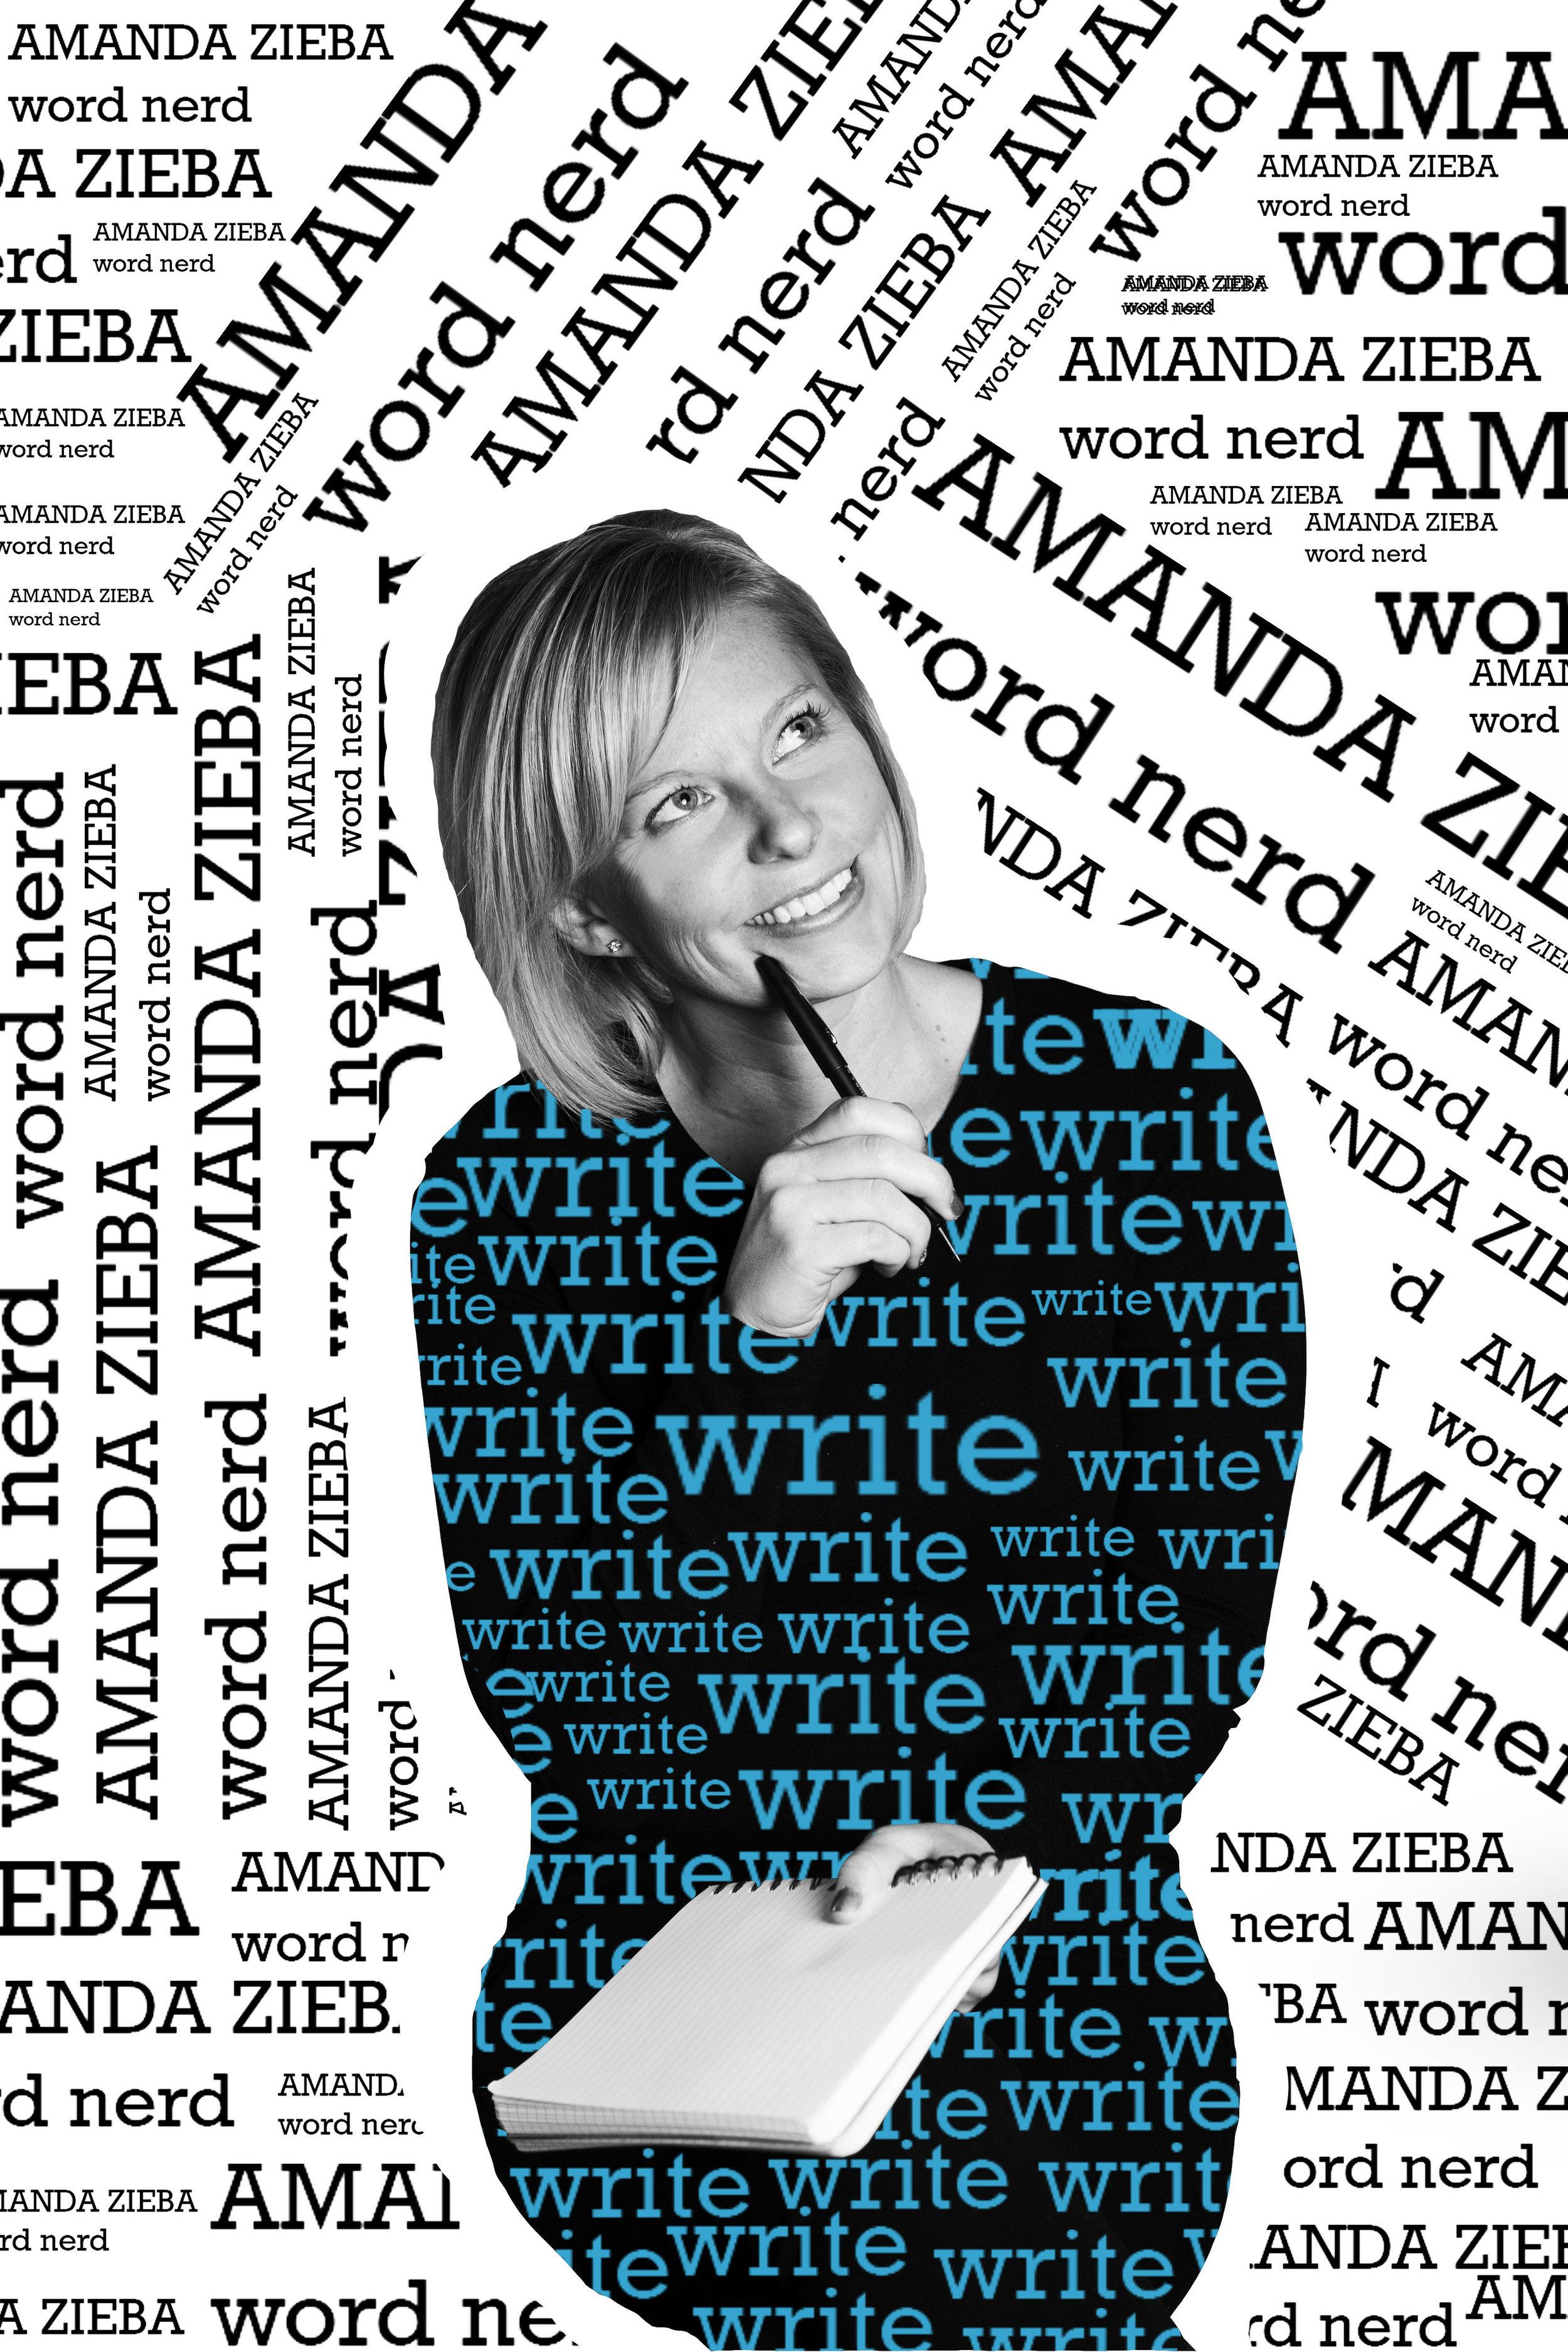 english creative writing minor ucf SRAR com